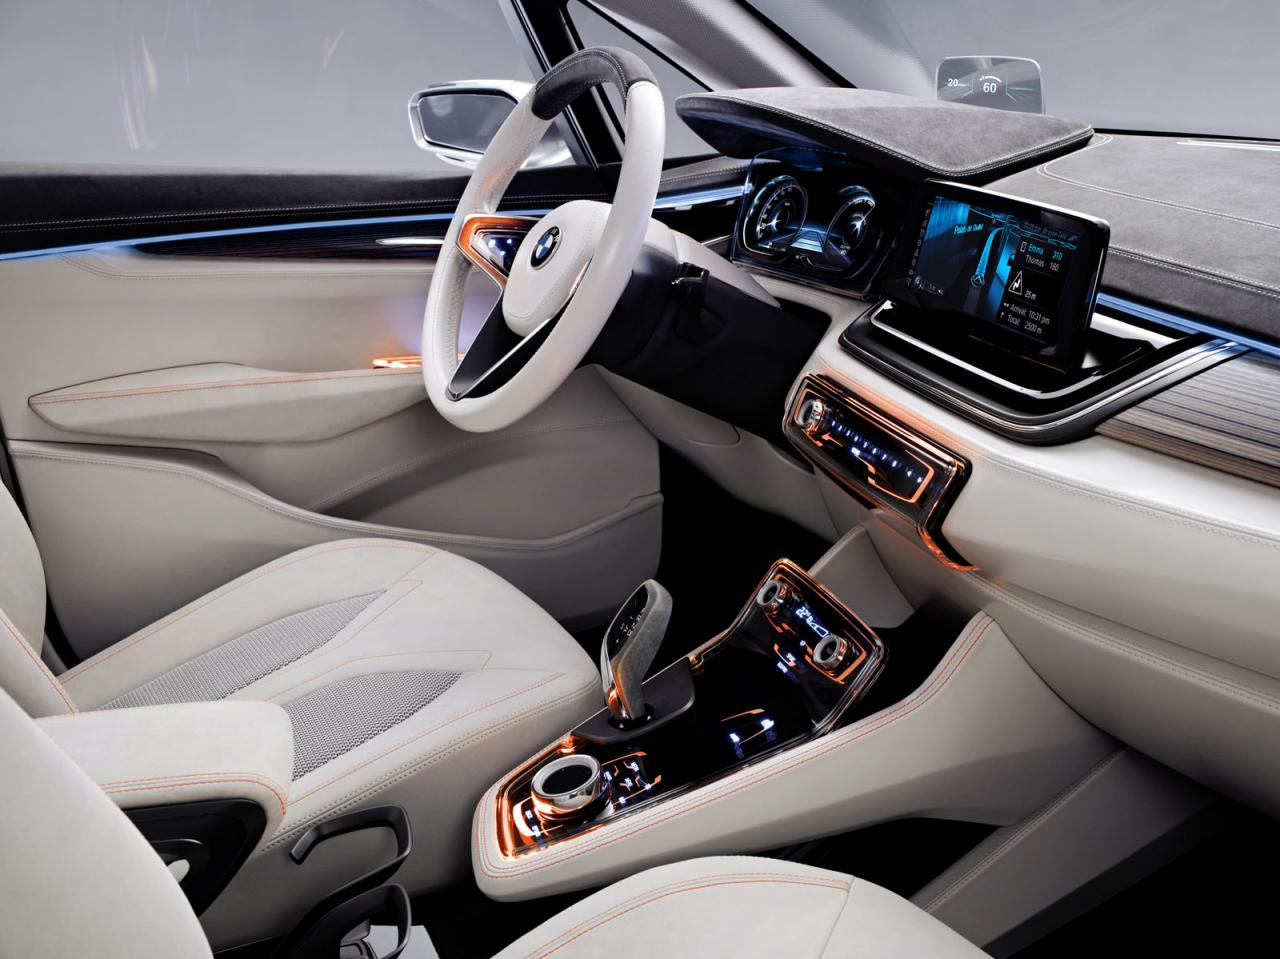 BMW+Concept+Active+Tourer+3.jpg